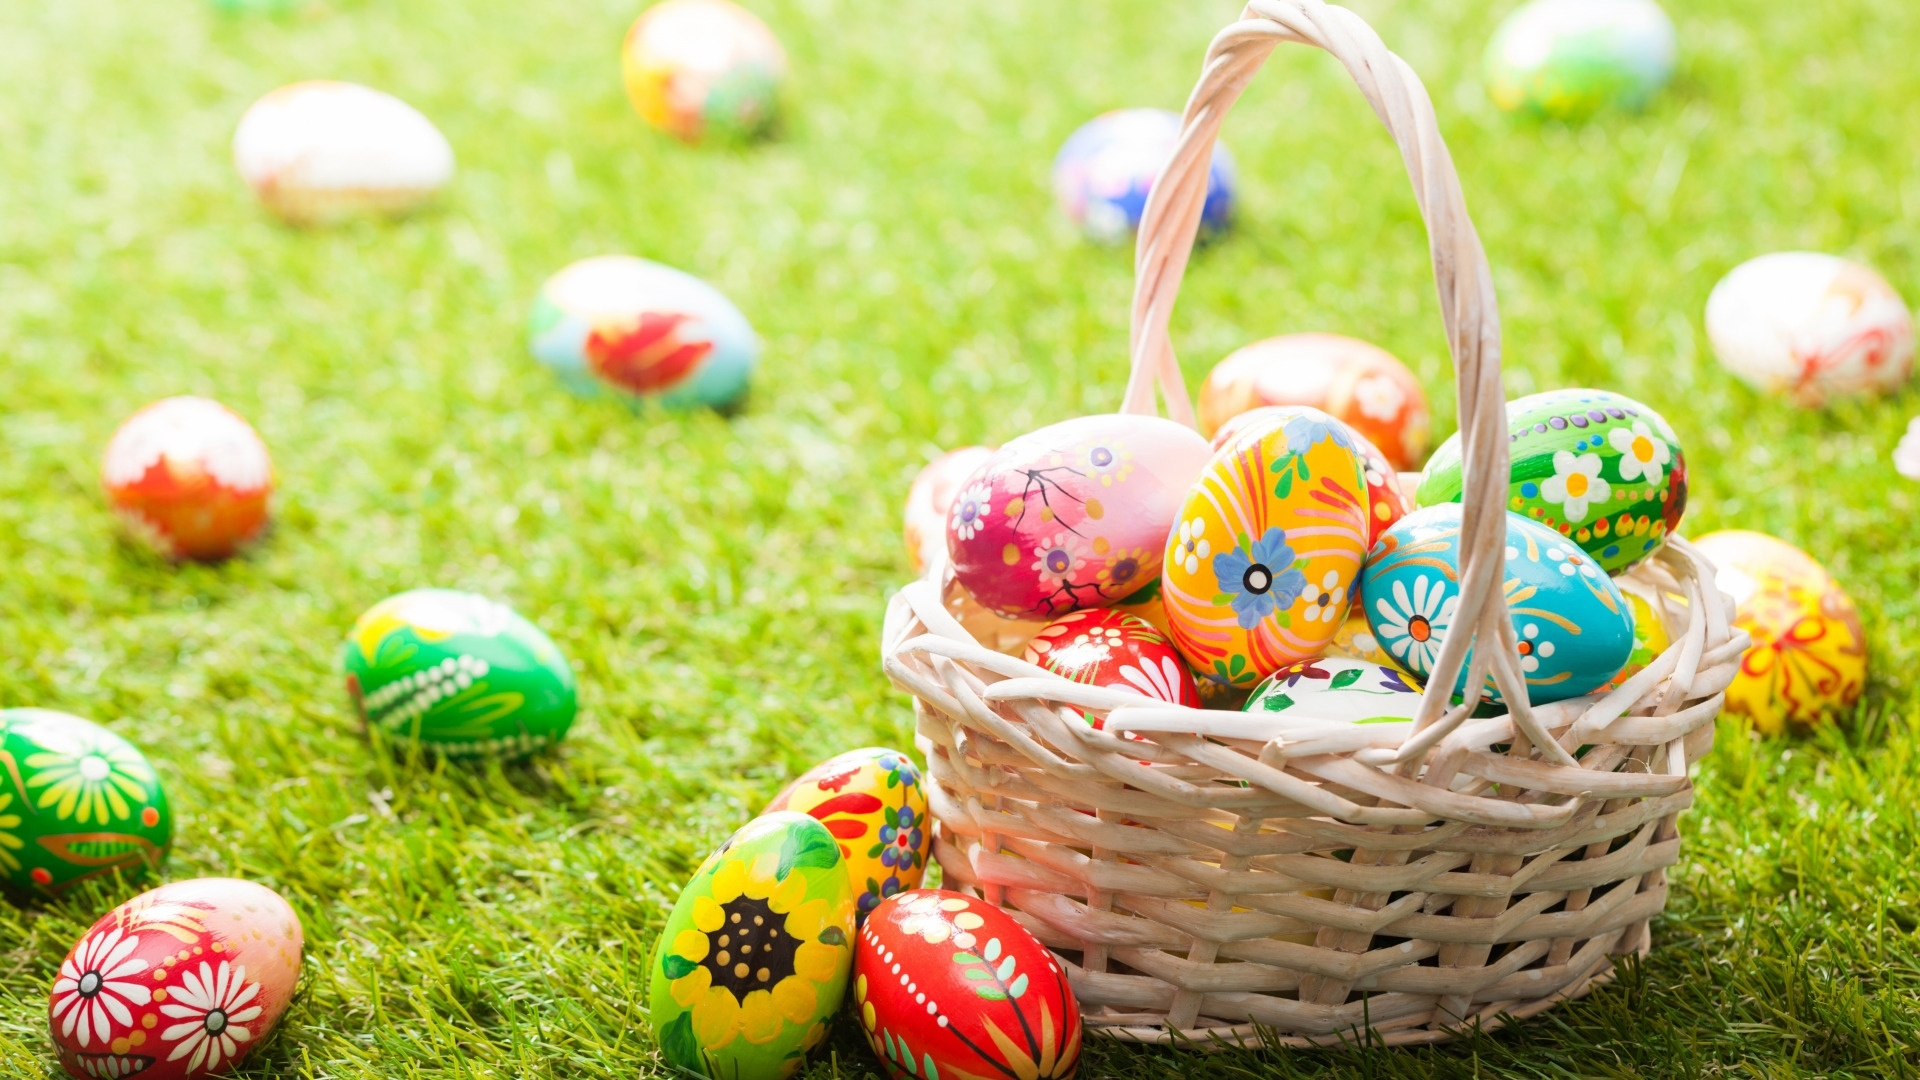 Easter Eggs In A Basket Wallpaper